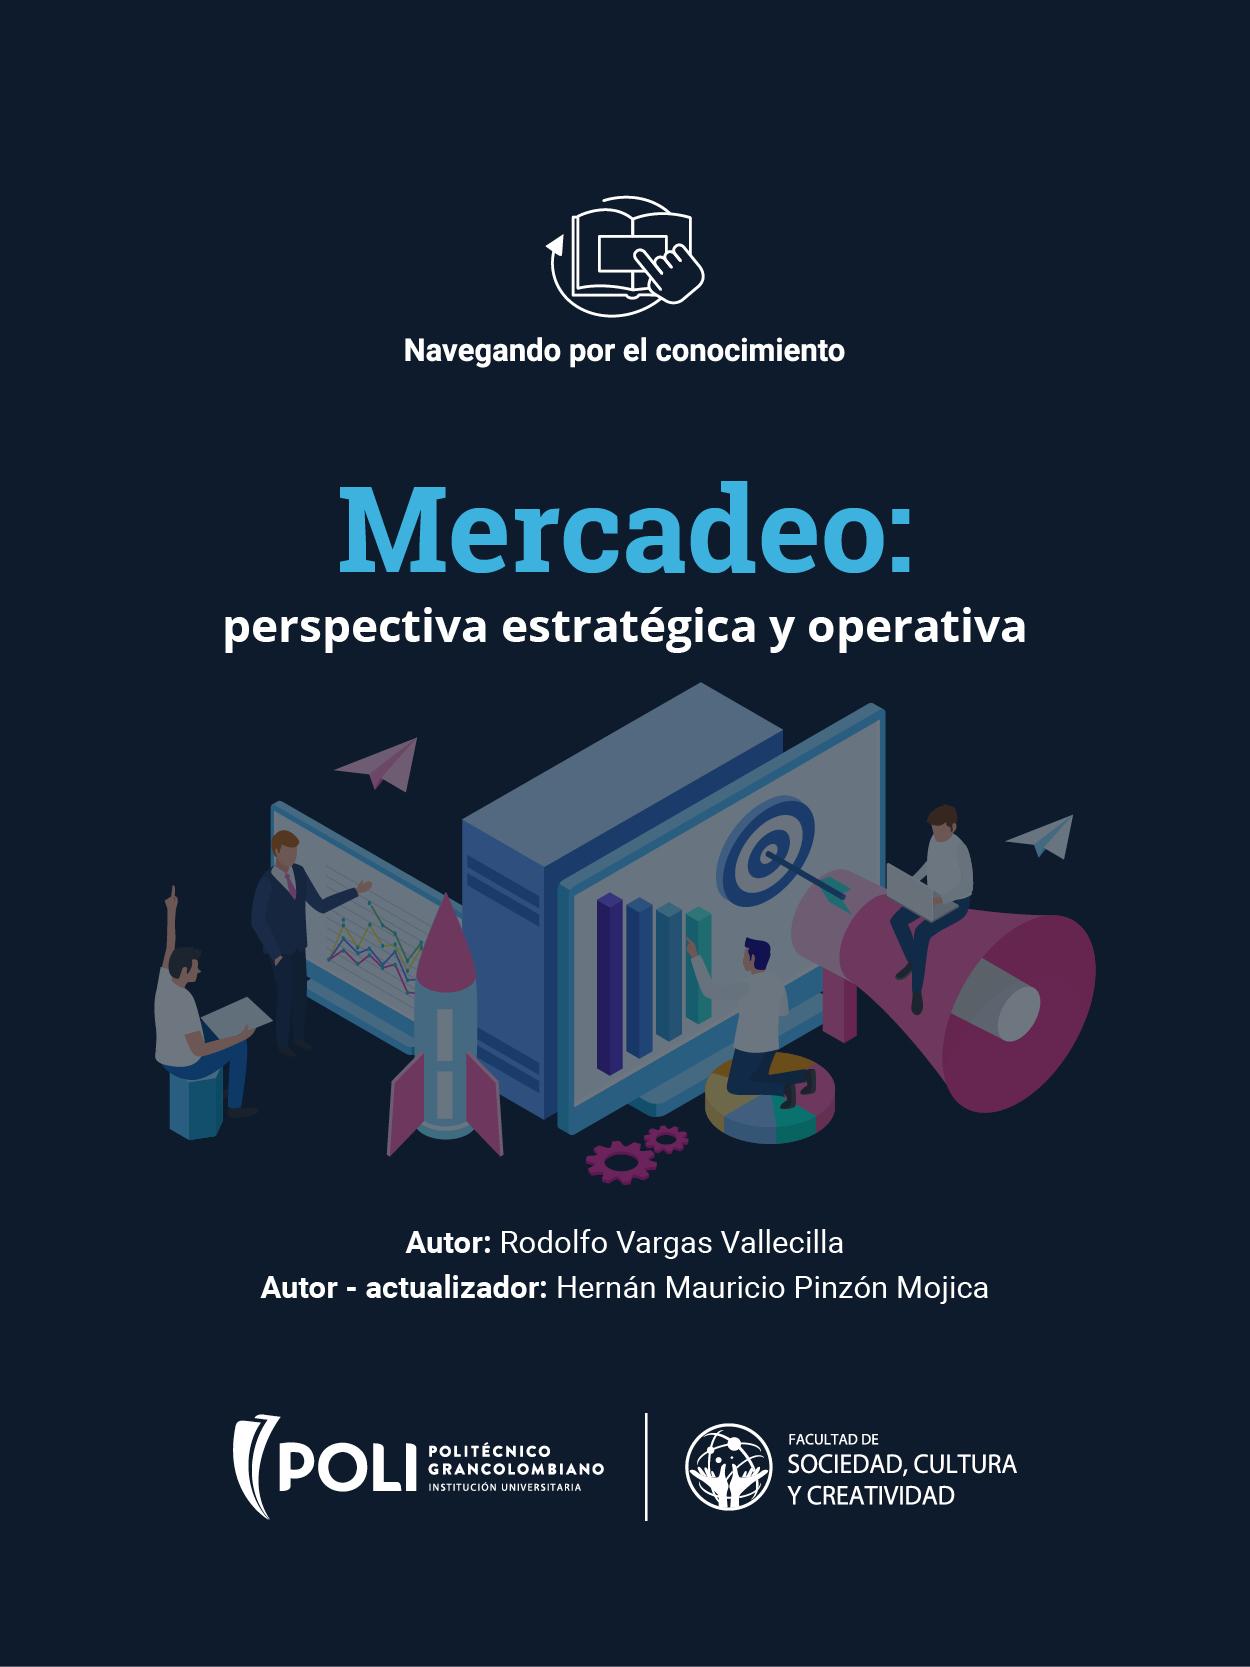 Mercadeo: perspectiva estratégica y operativa